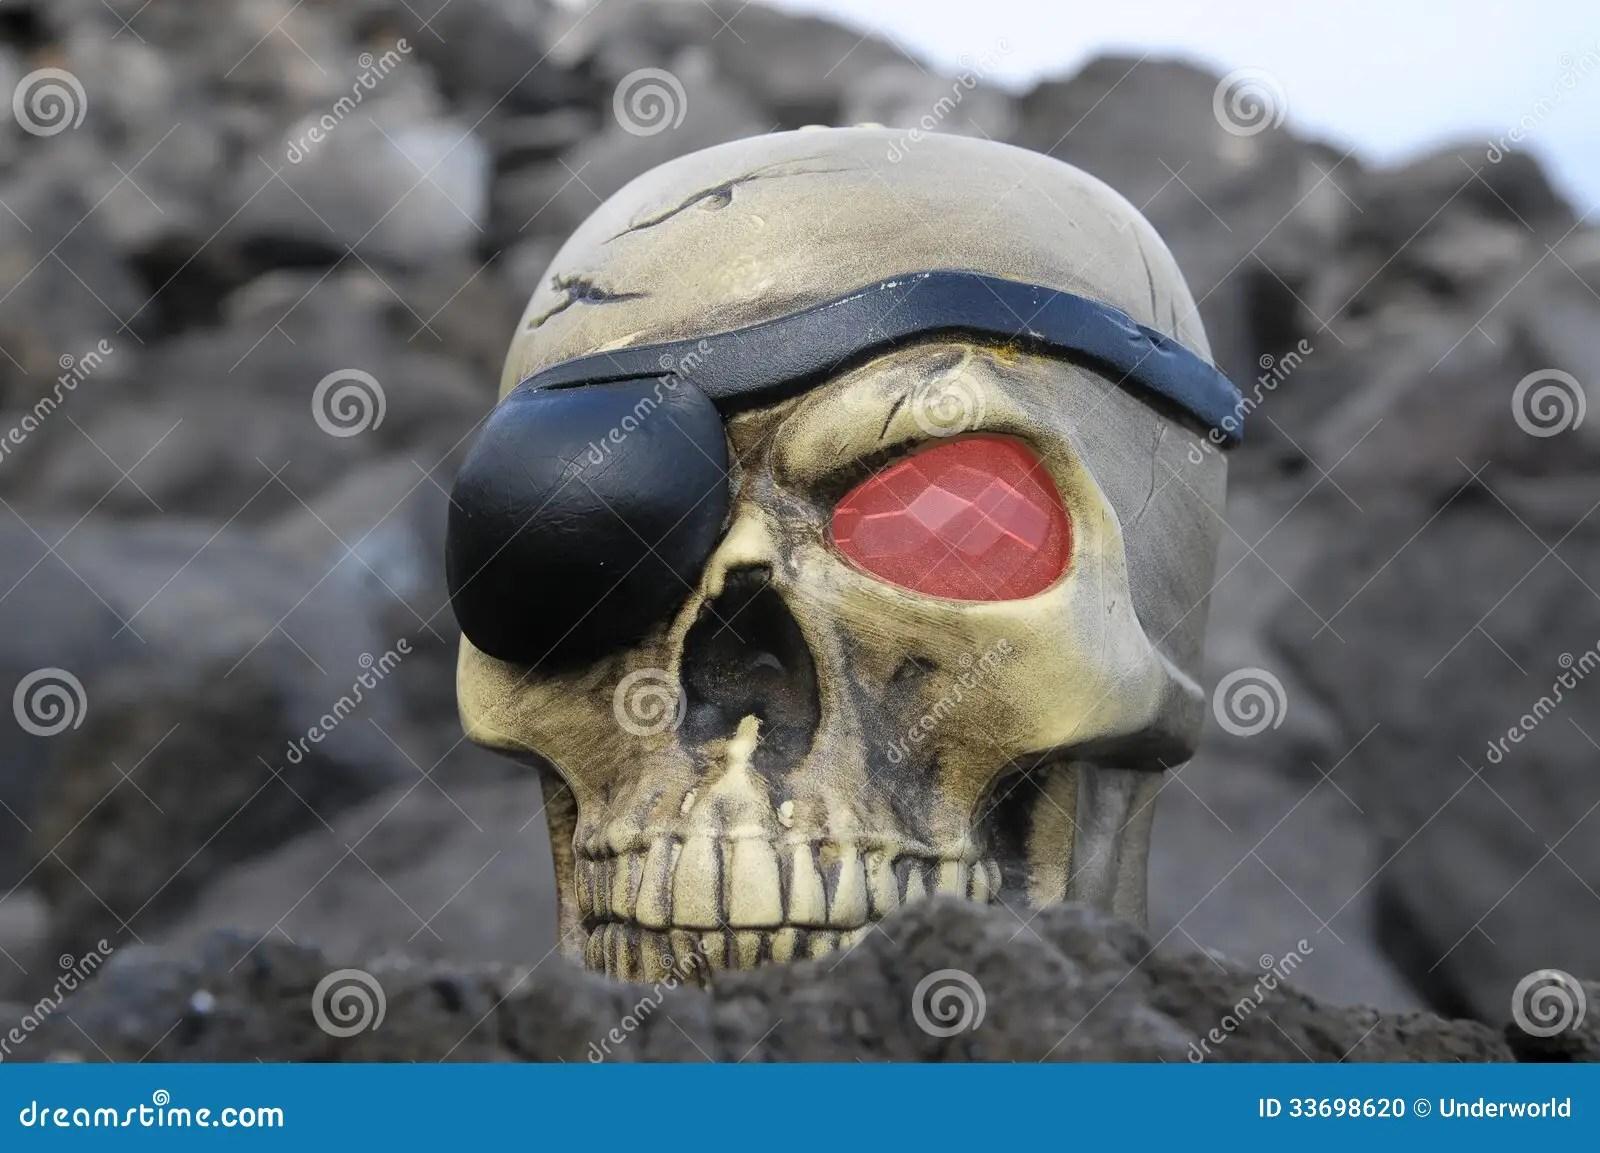 Crossbones Patch Skull And Bandana Eye